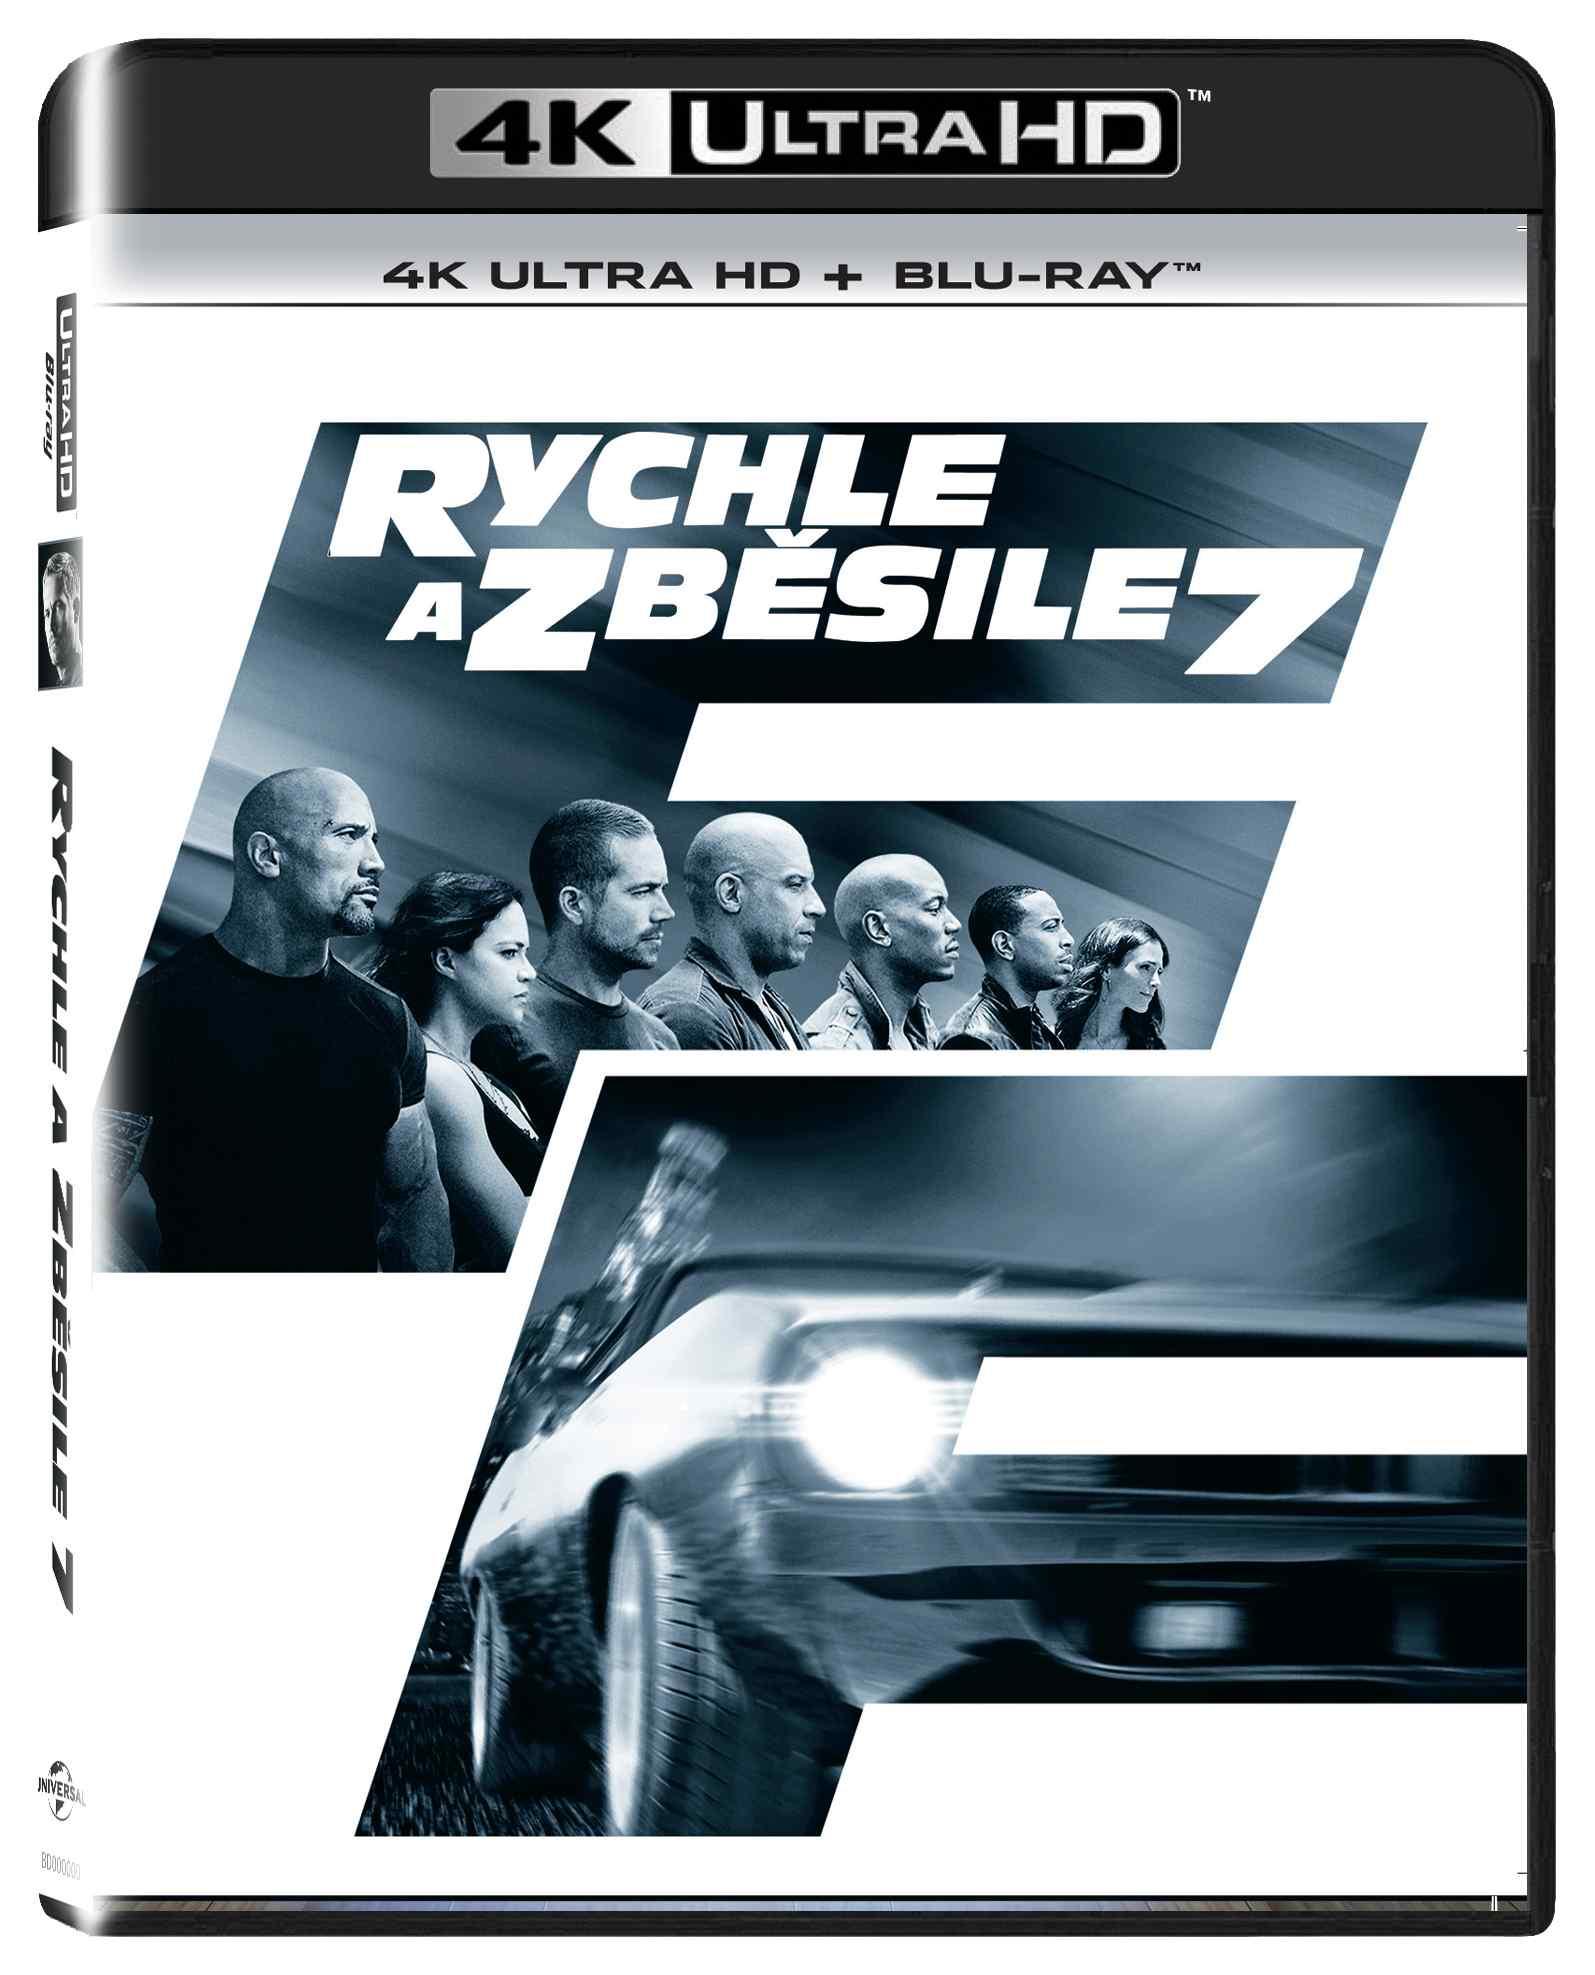 RYCHLE A ZBĚSILE 7 (4K ULTRA HD) - UHD Blu-ray + Blu-ray (2 BD)